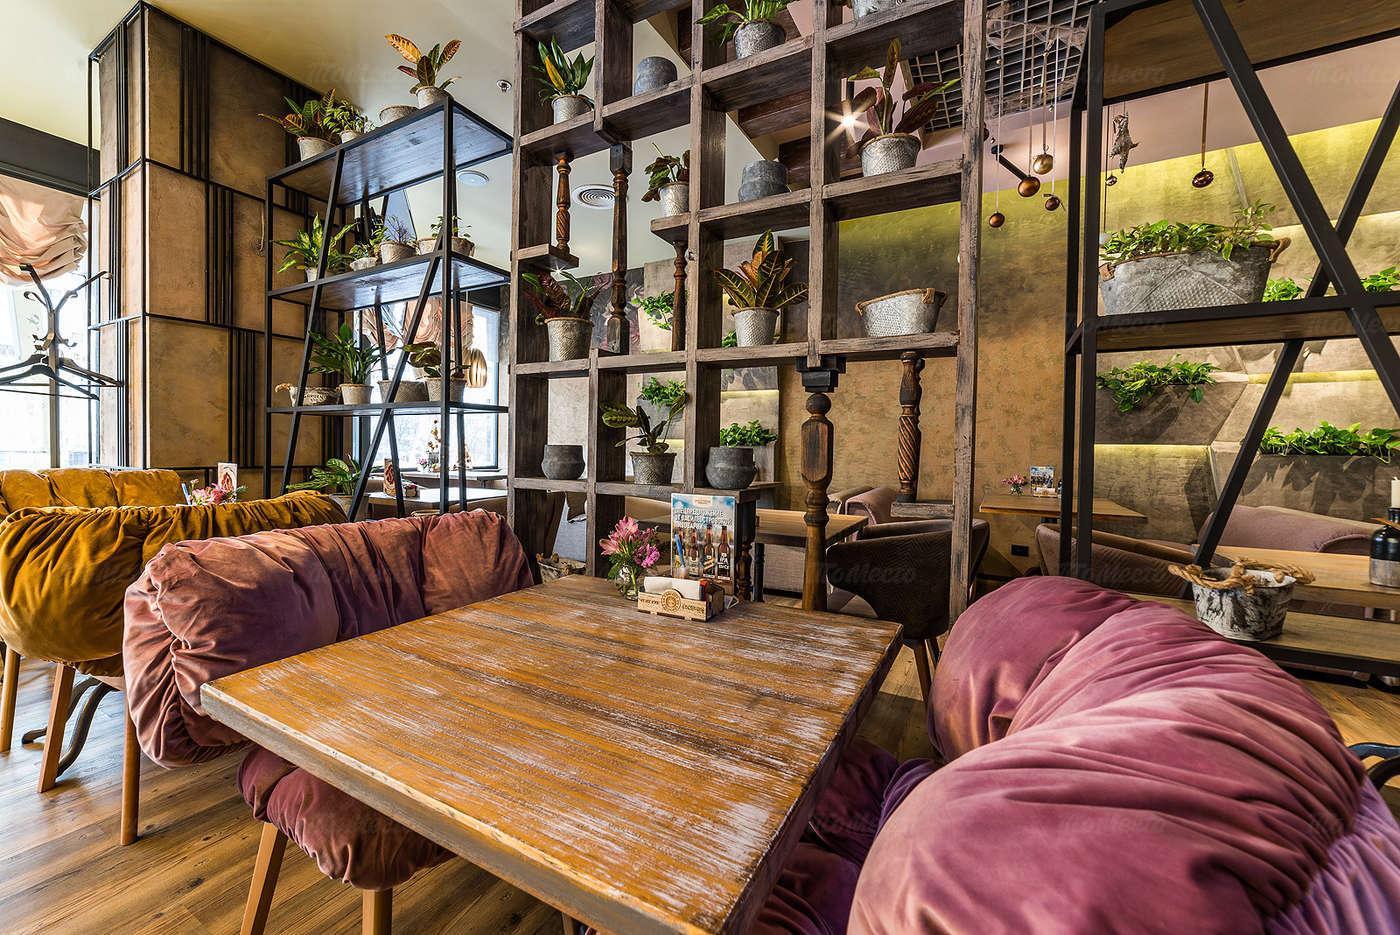 Ресторан Шато Винтаж (Chateau Vintage) на проспекте Энгельса фото 8